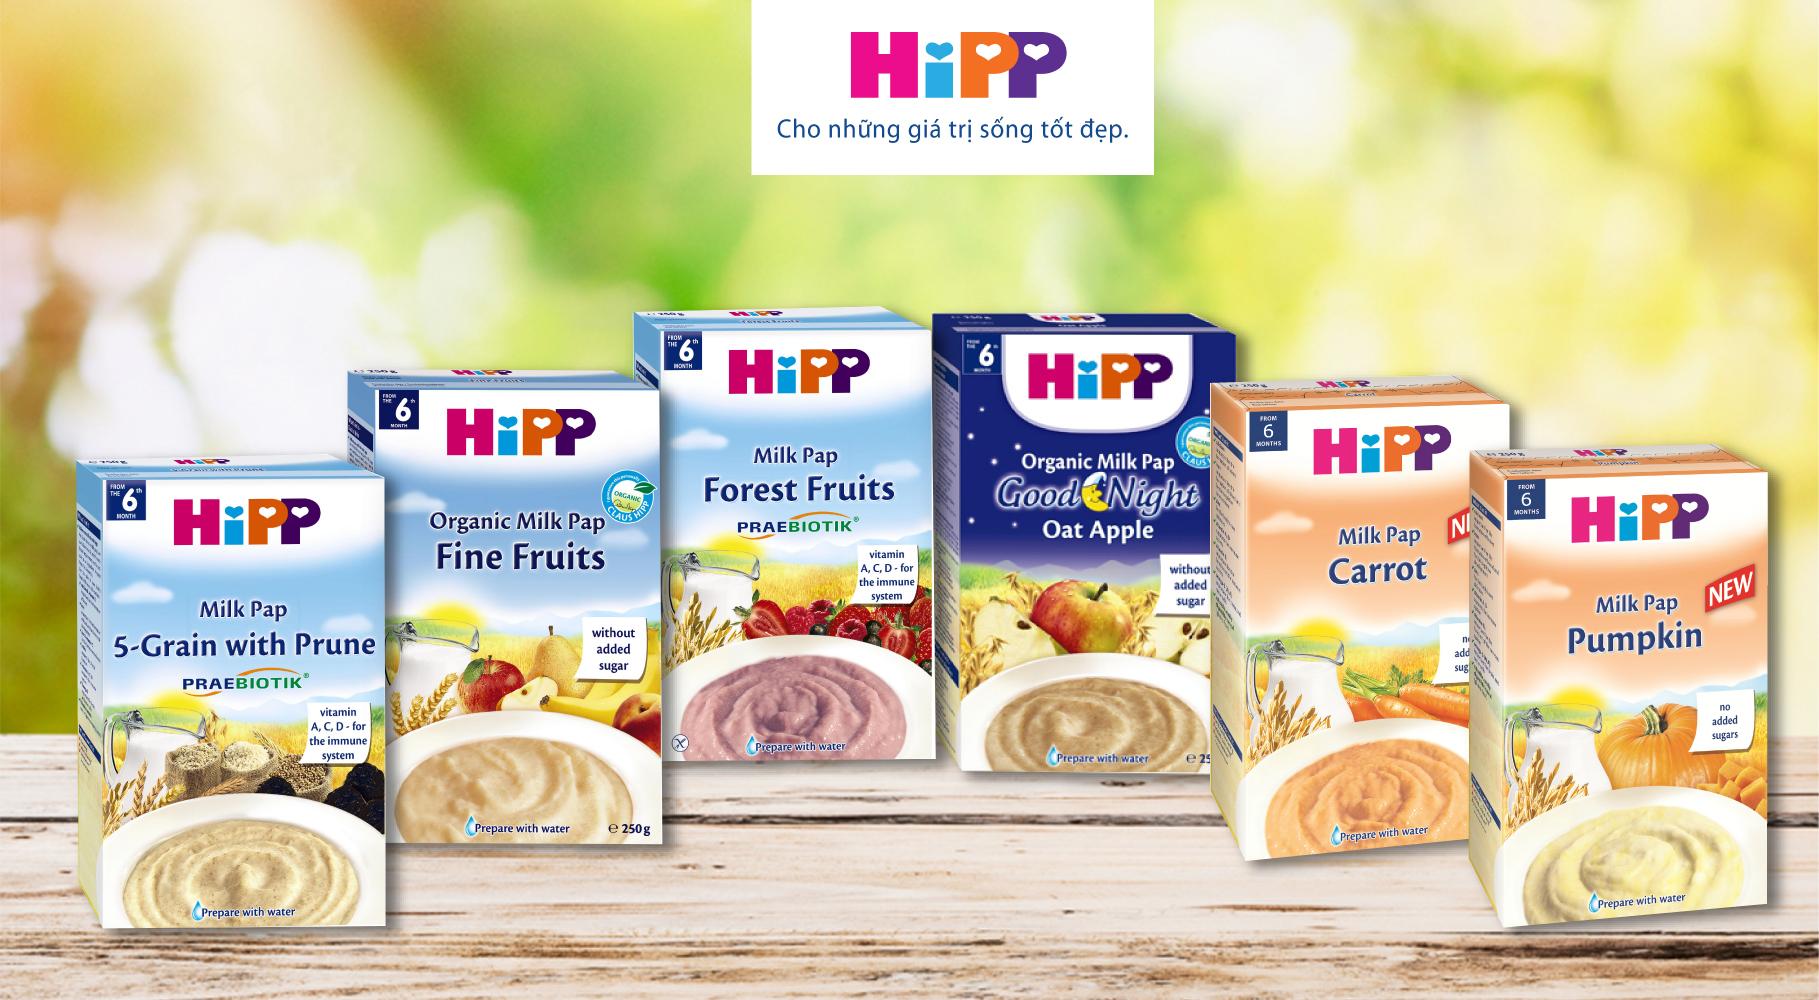 HiPP-Milk-Pap